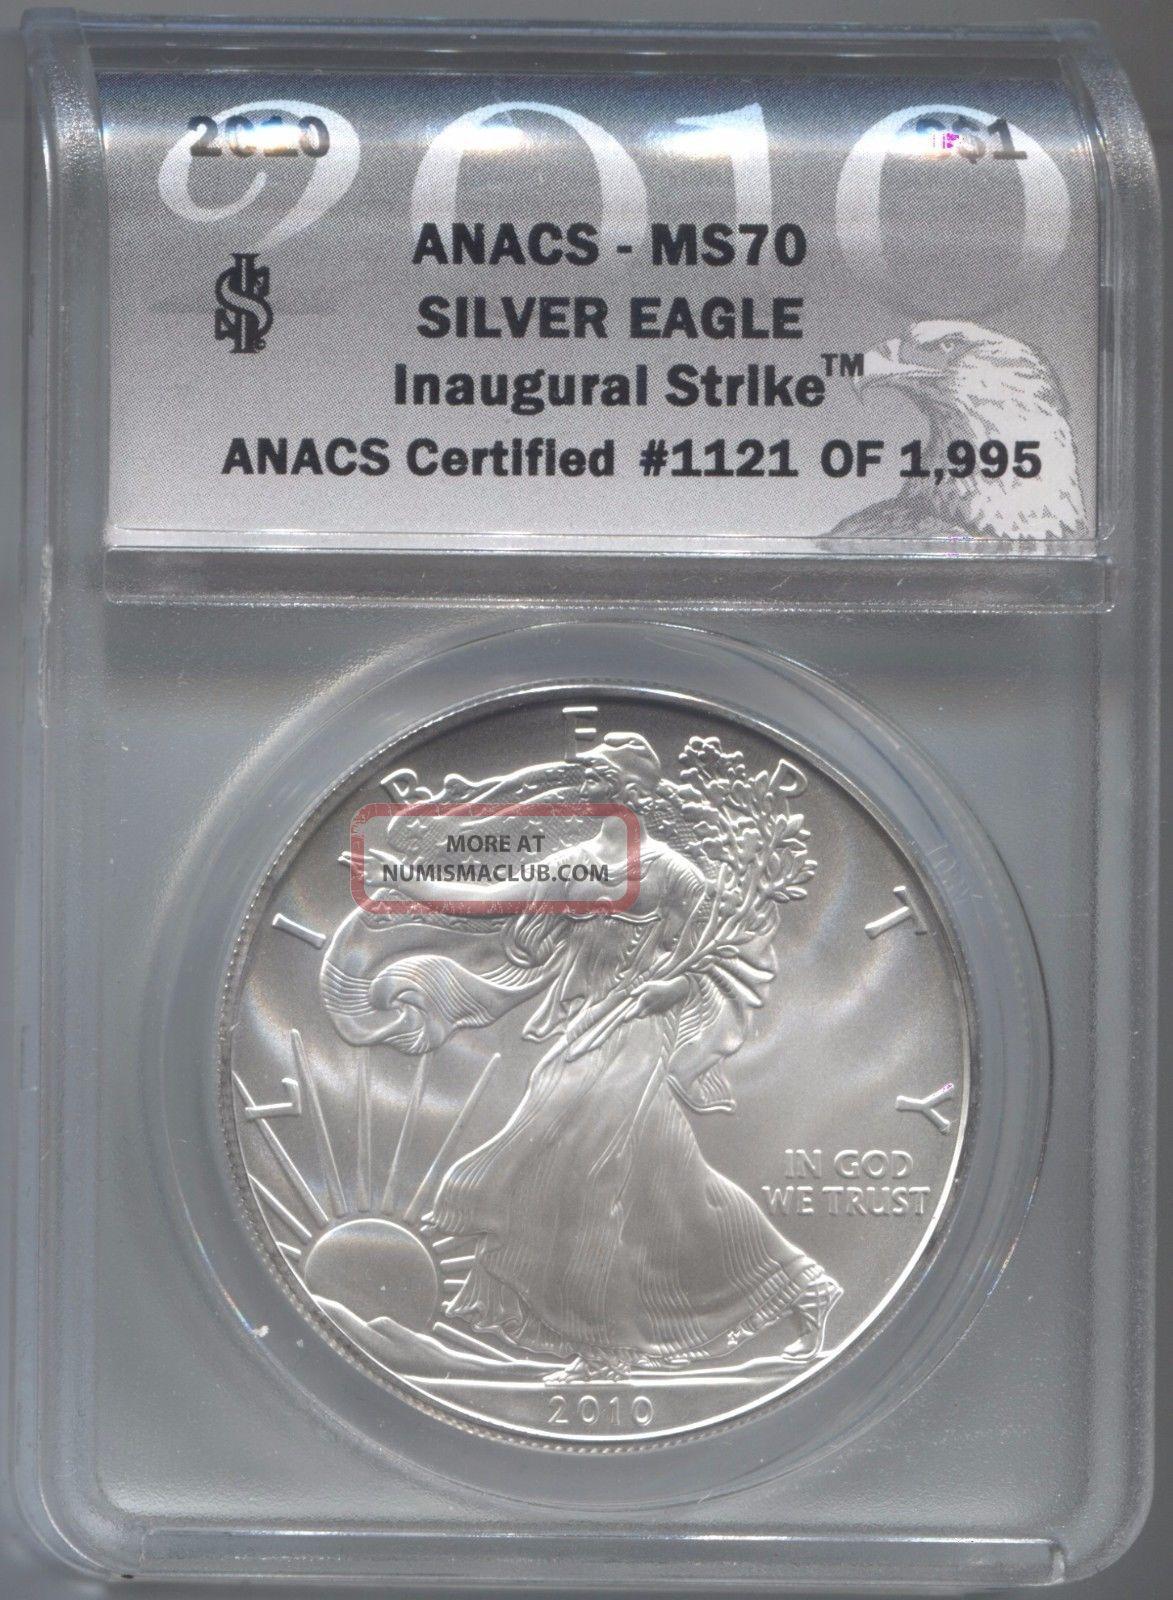 2010 Anacs Ms70 Inaugural Strike 1121 Of 1995 Silver Eagle Silver photo